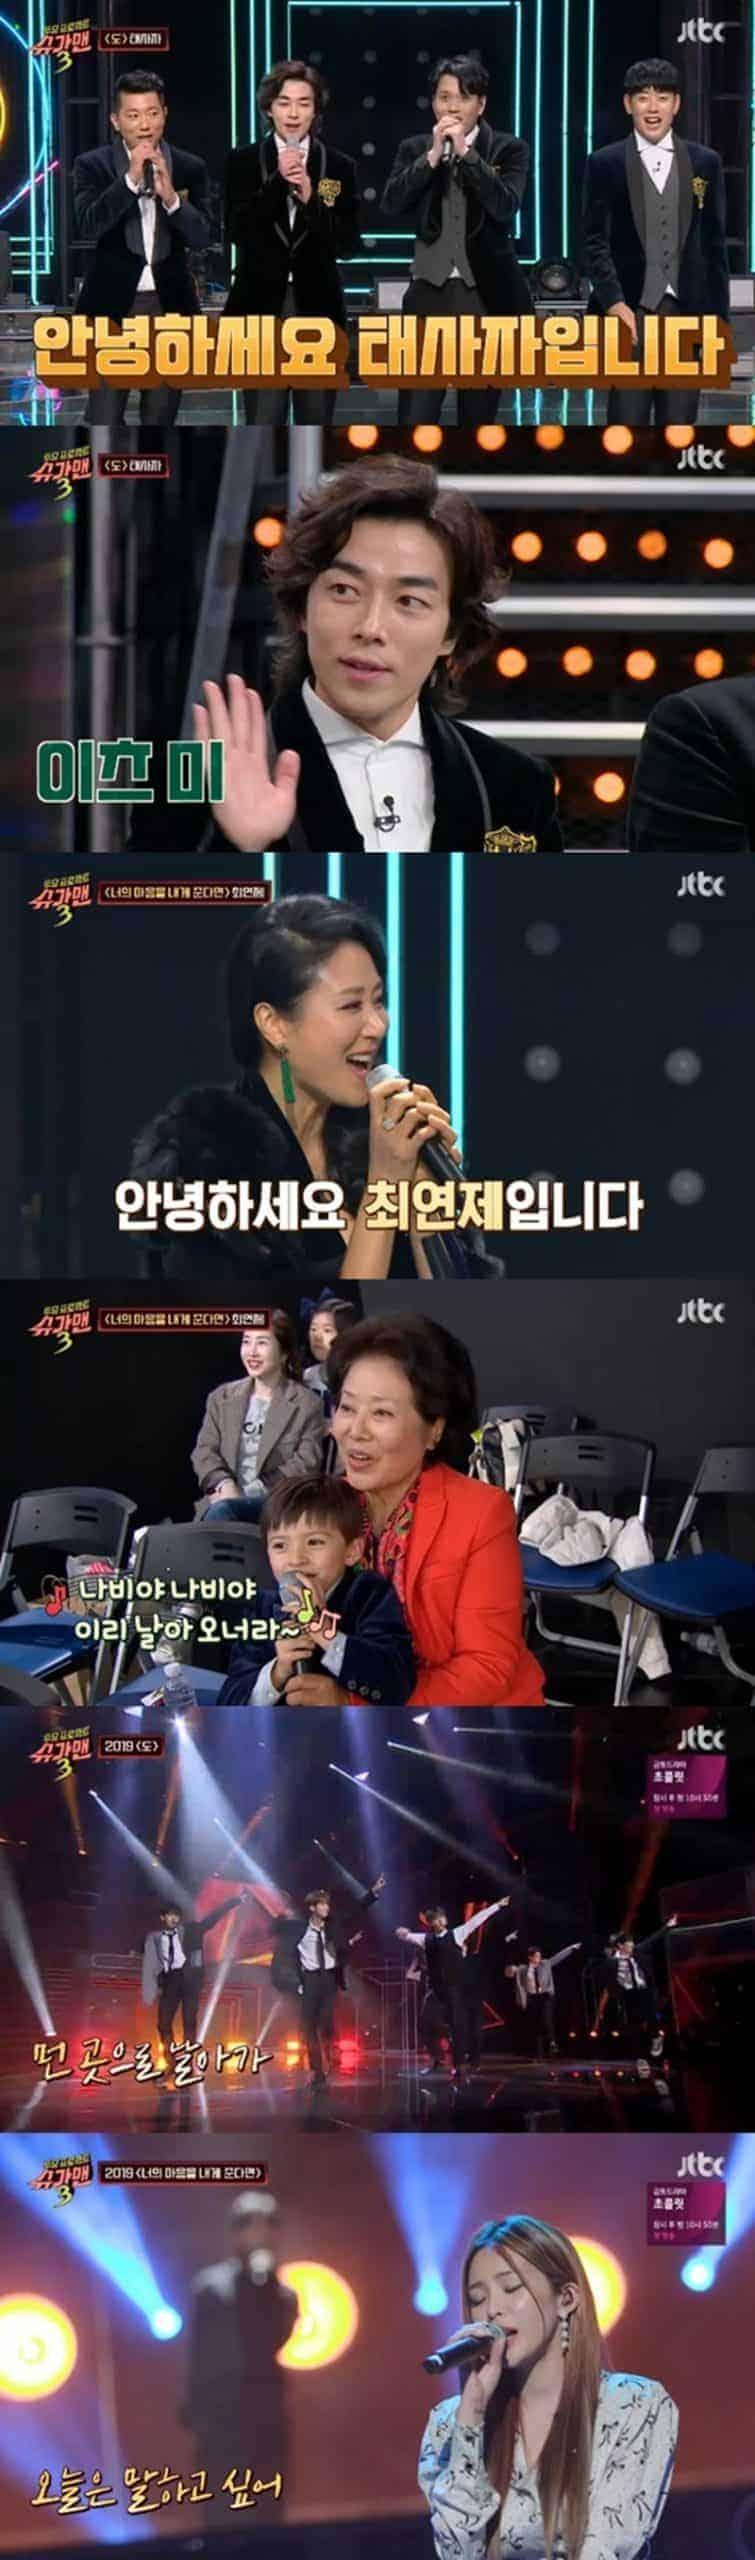 JTBC '슈가맨3' © 갓잇코리아